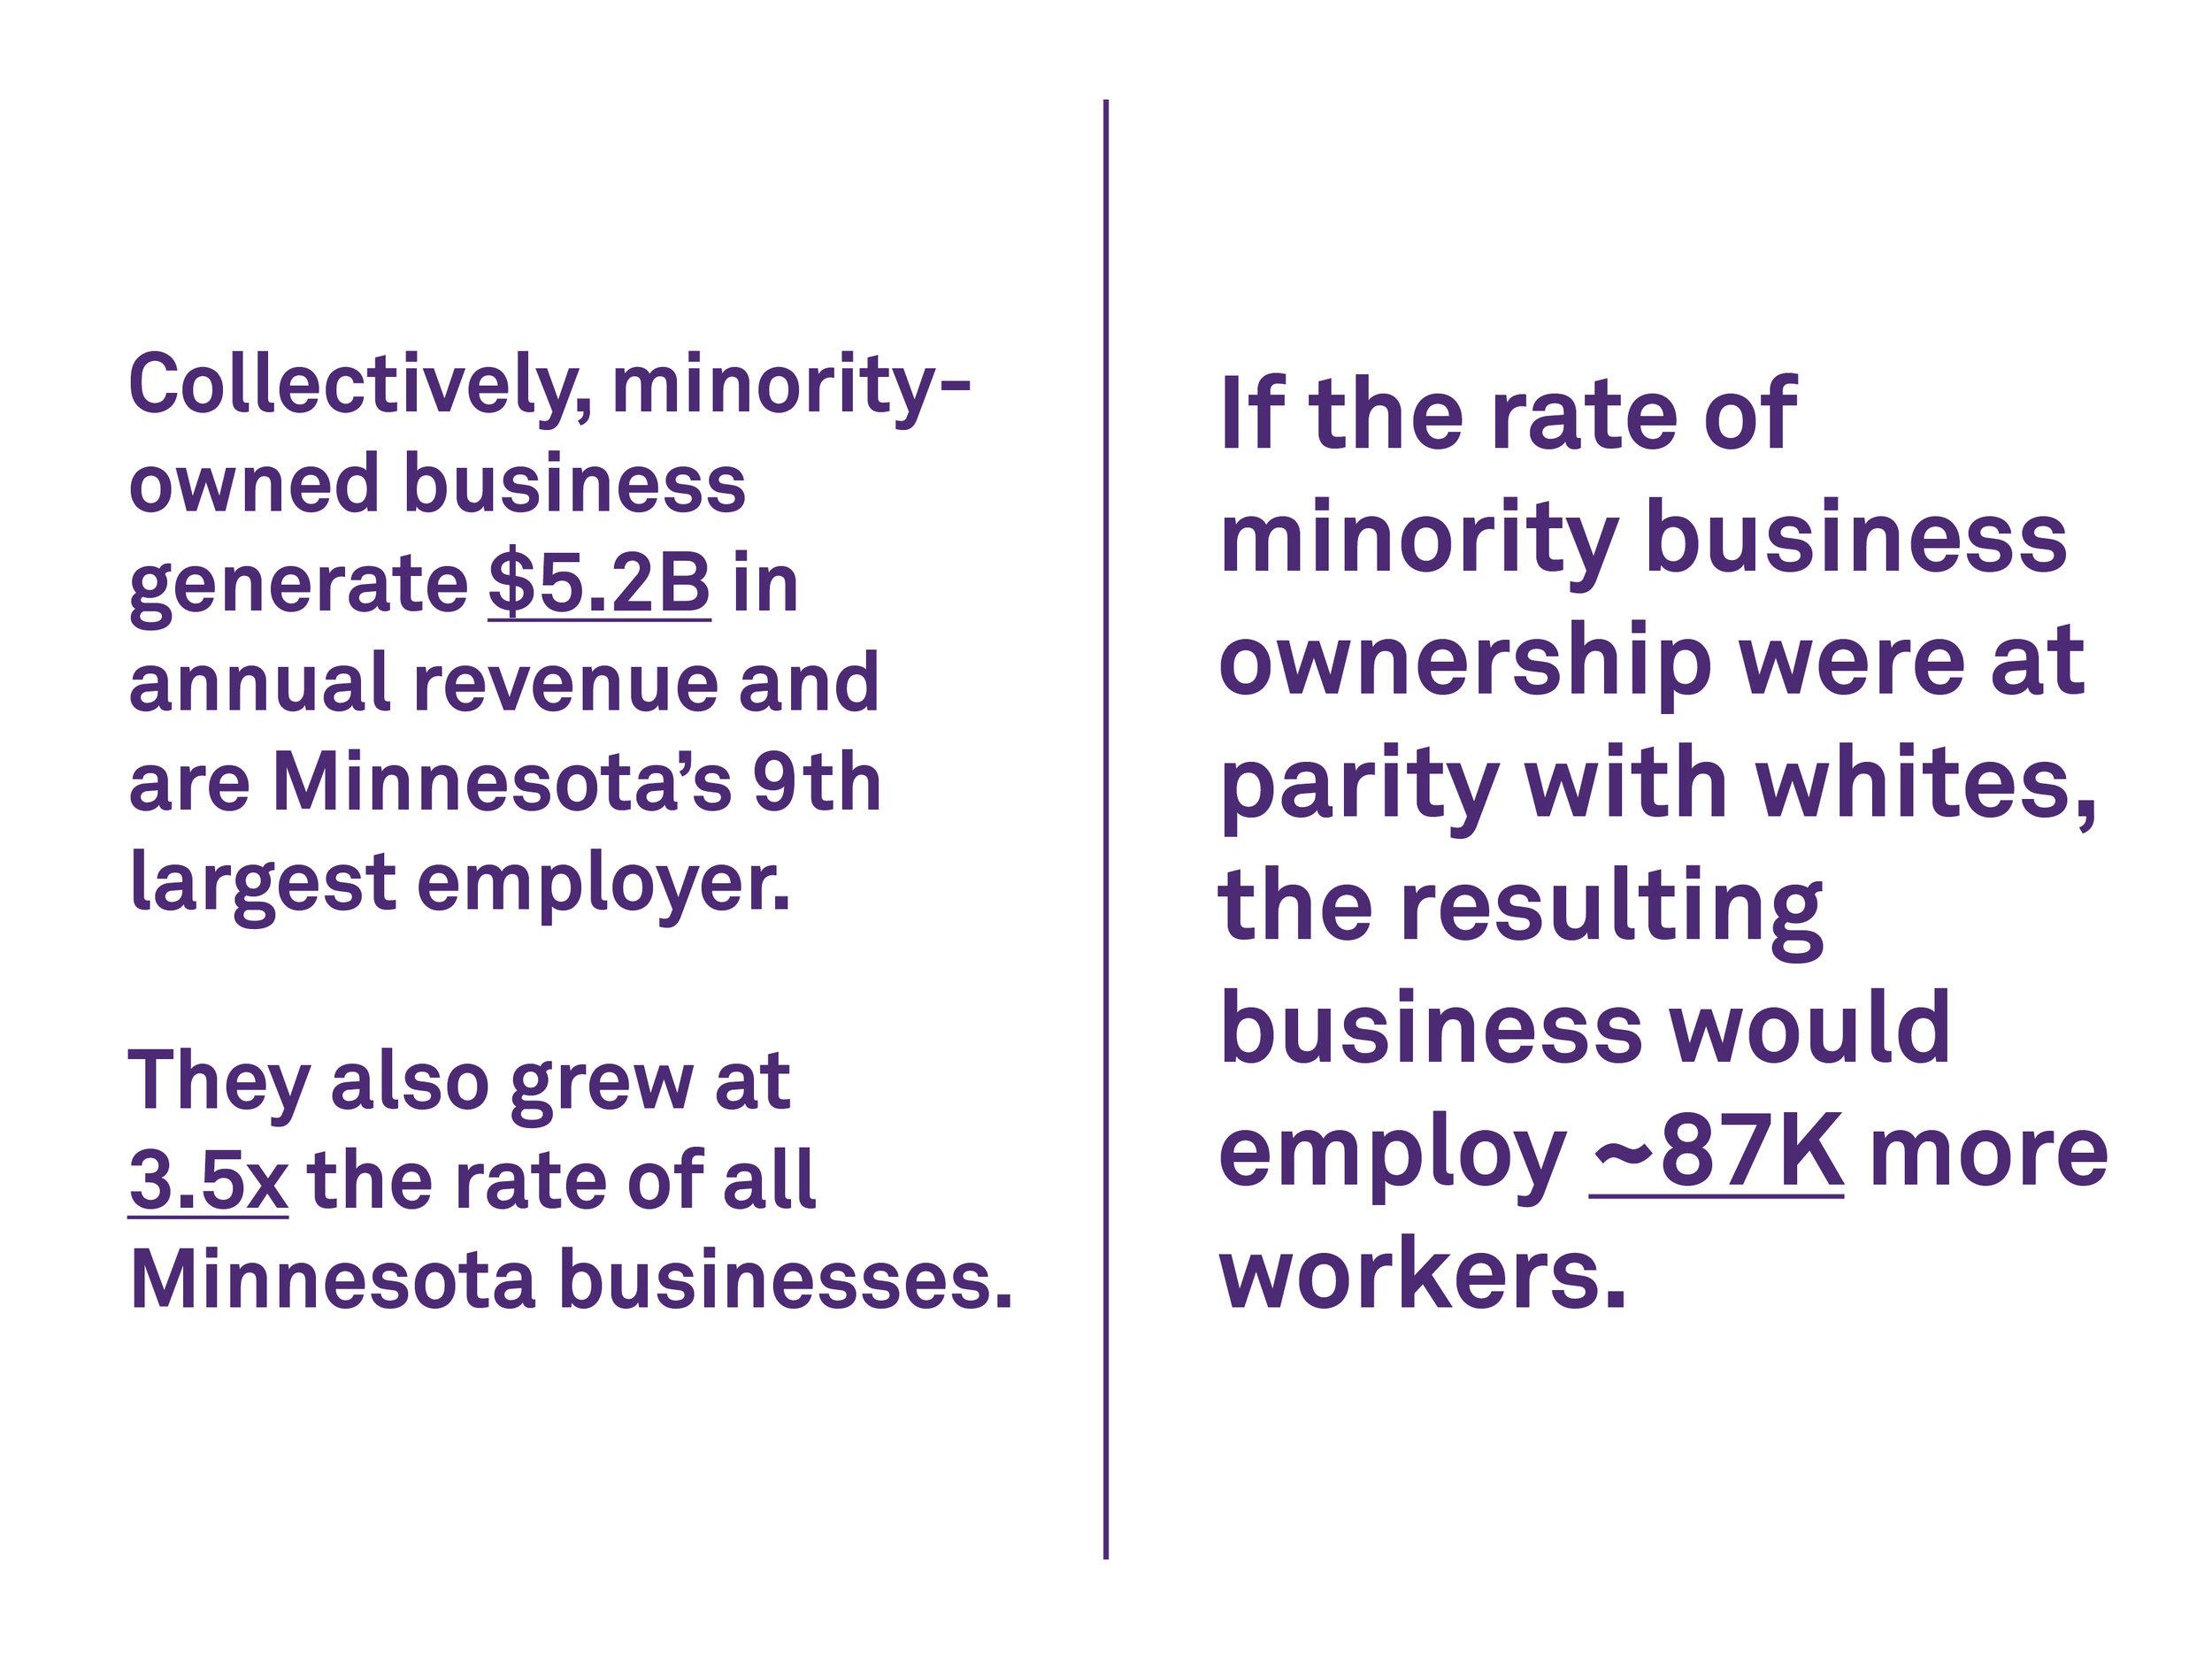 minoritybusinessfacts.jpg